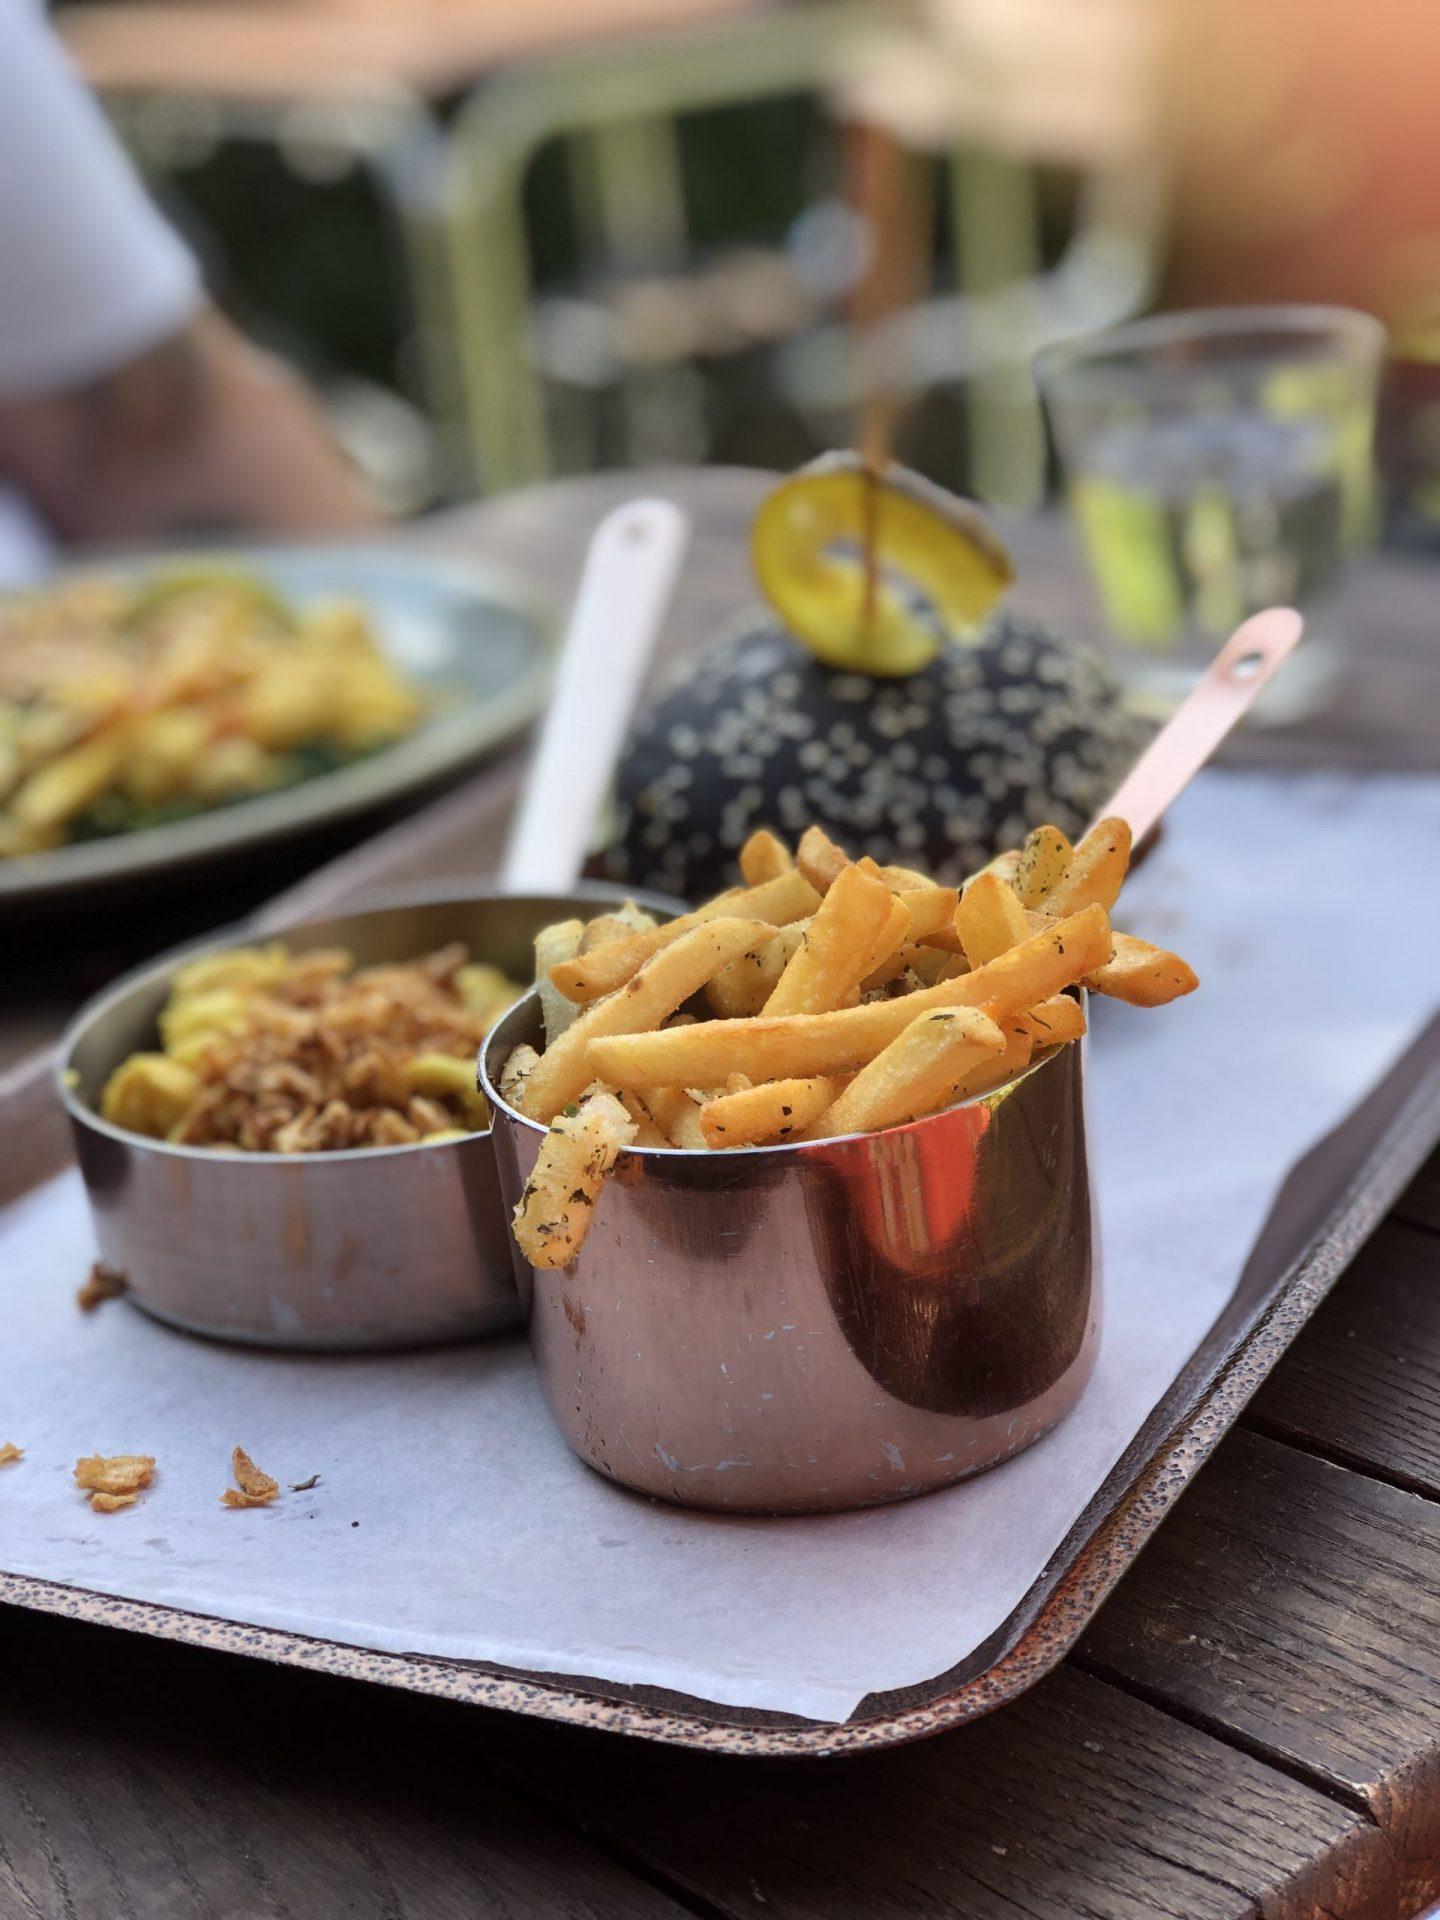 oak tree vegan restaurant essex